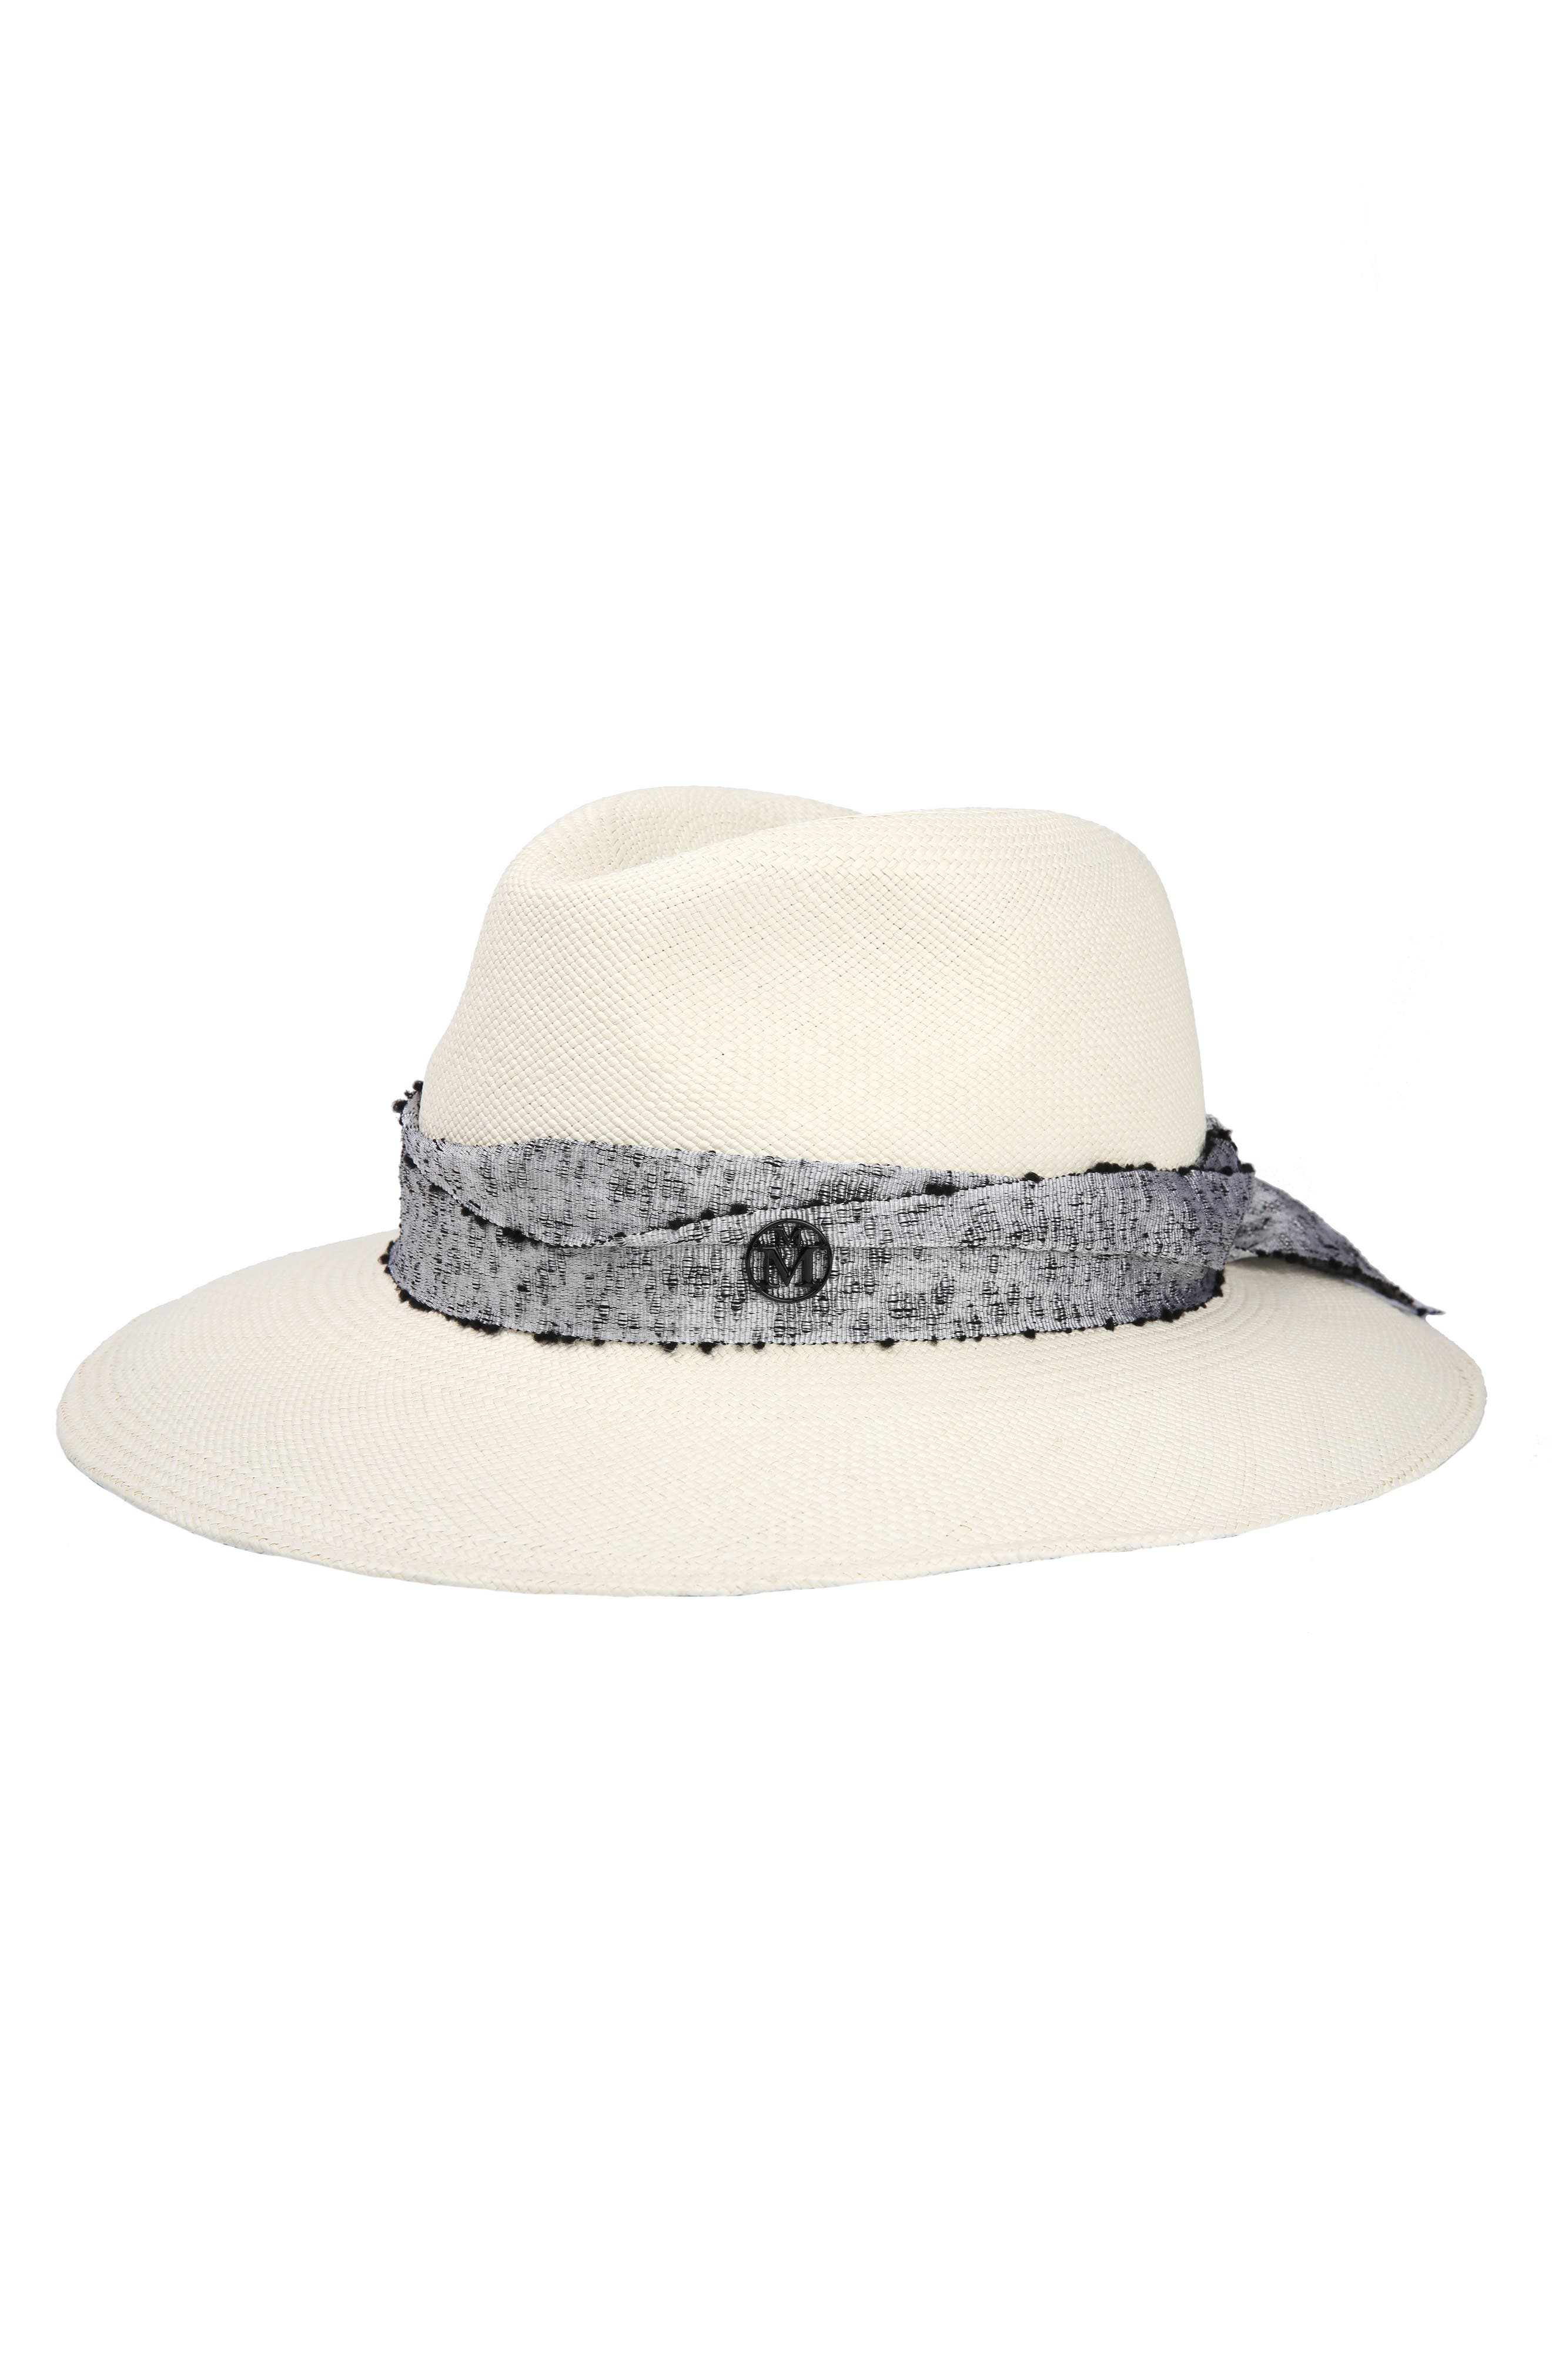 Henrietta Mottled Ribbon Hemp Hat,                         Main,                         color,